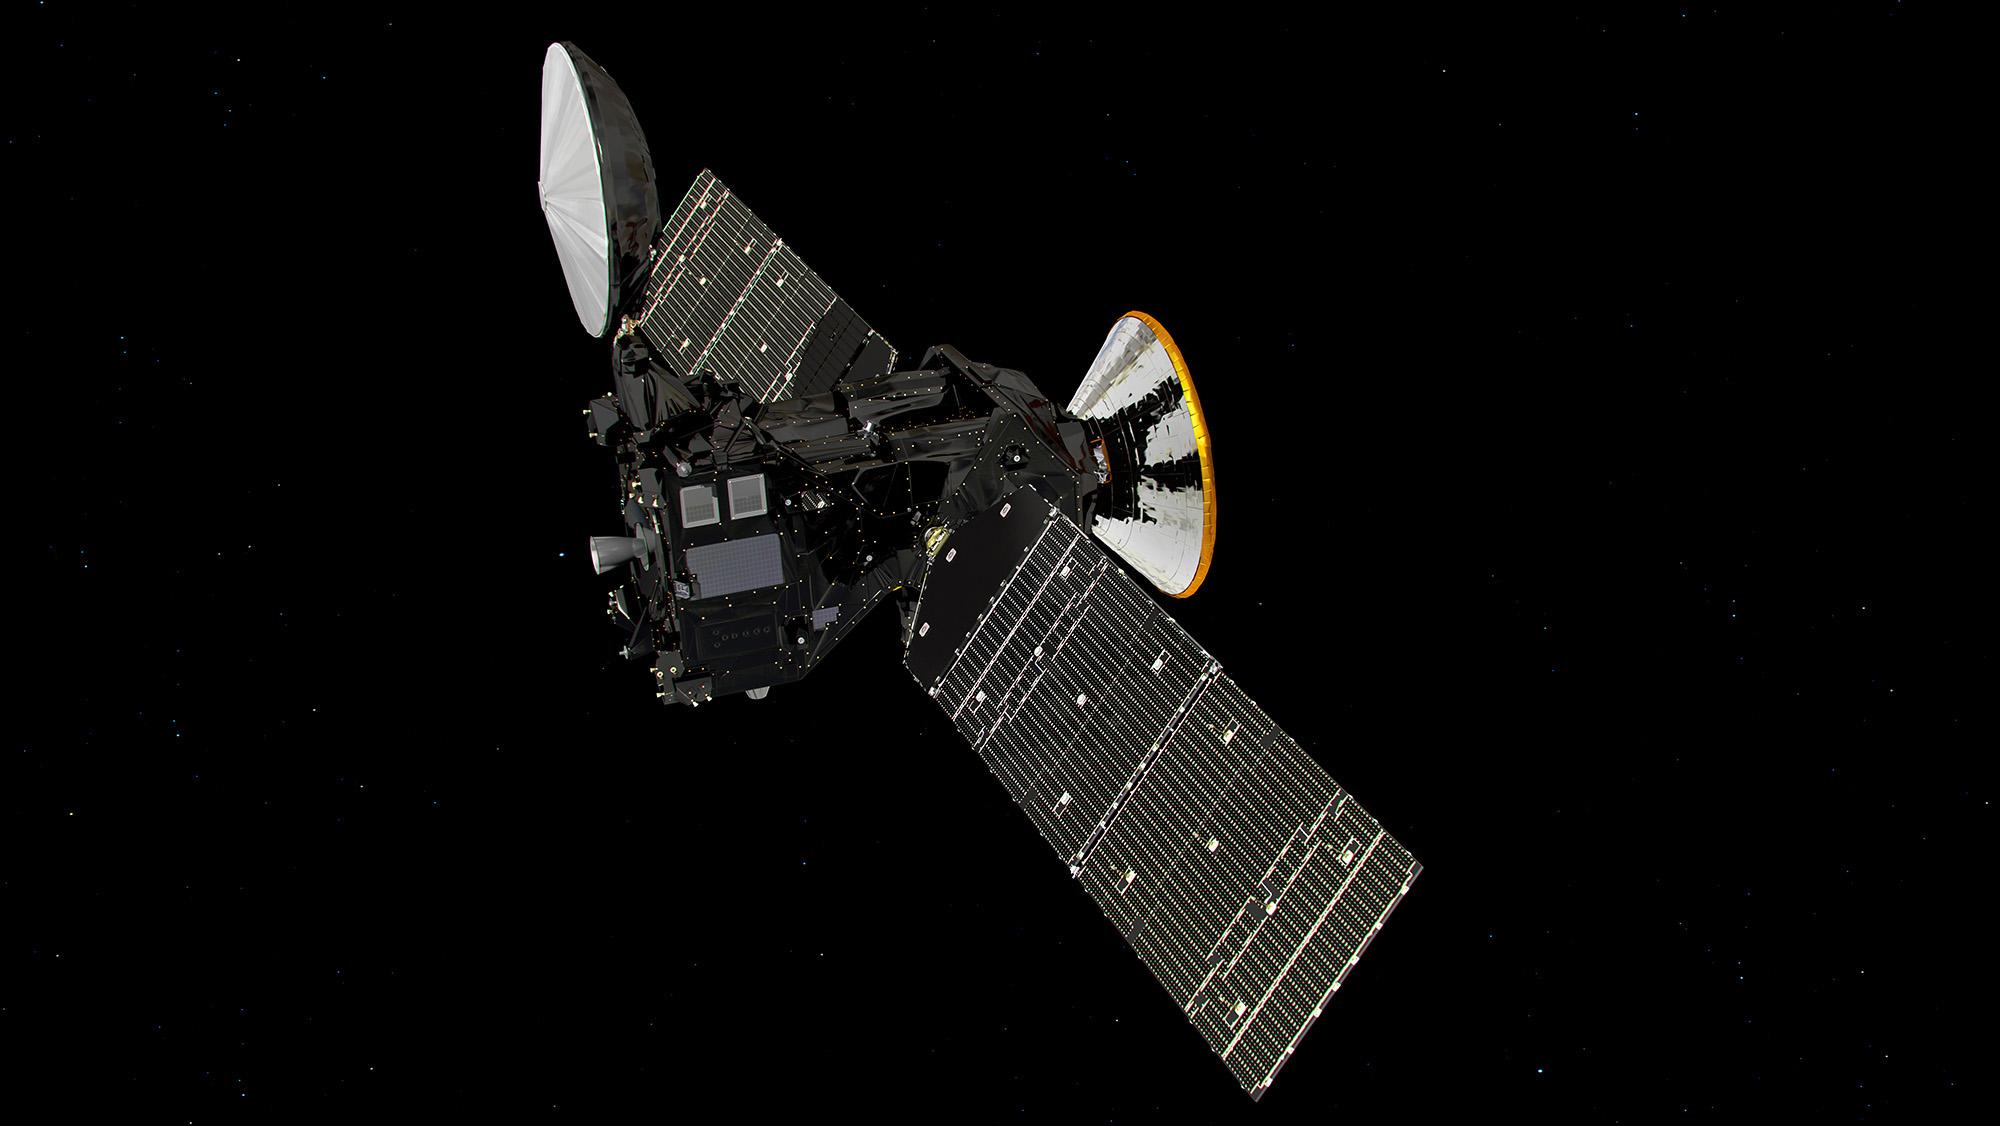 ExoMars/TGO cruise to Mars